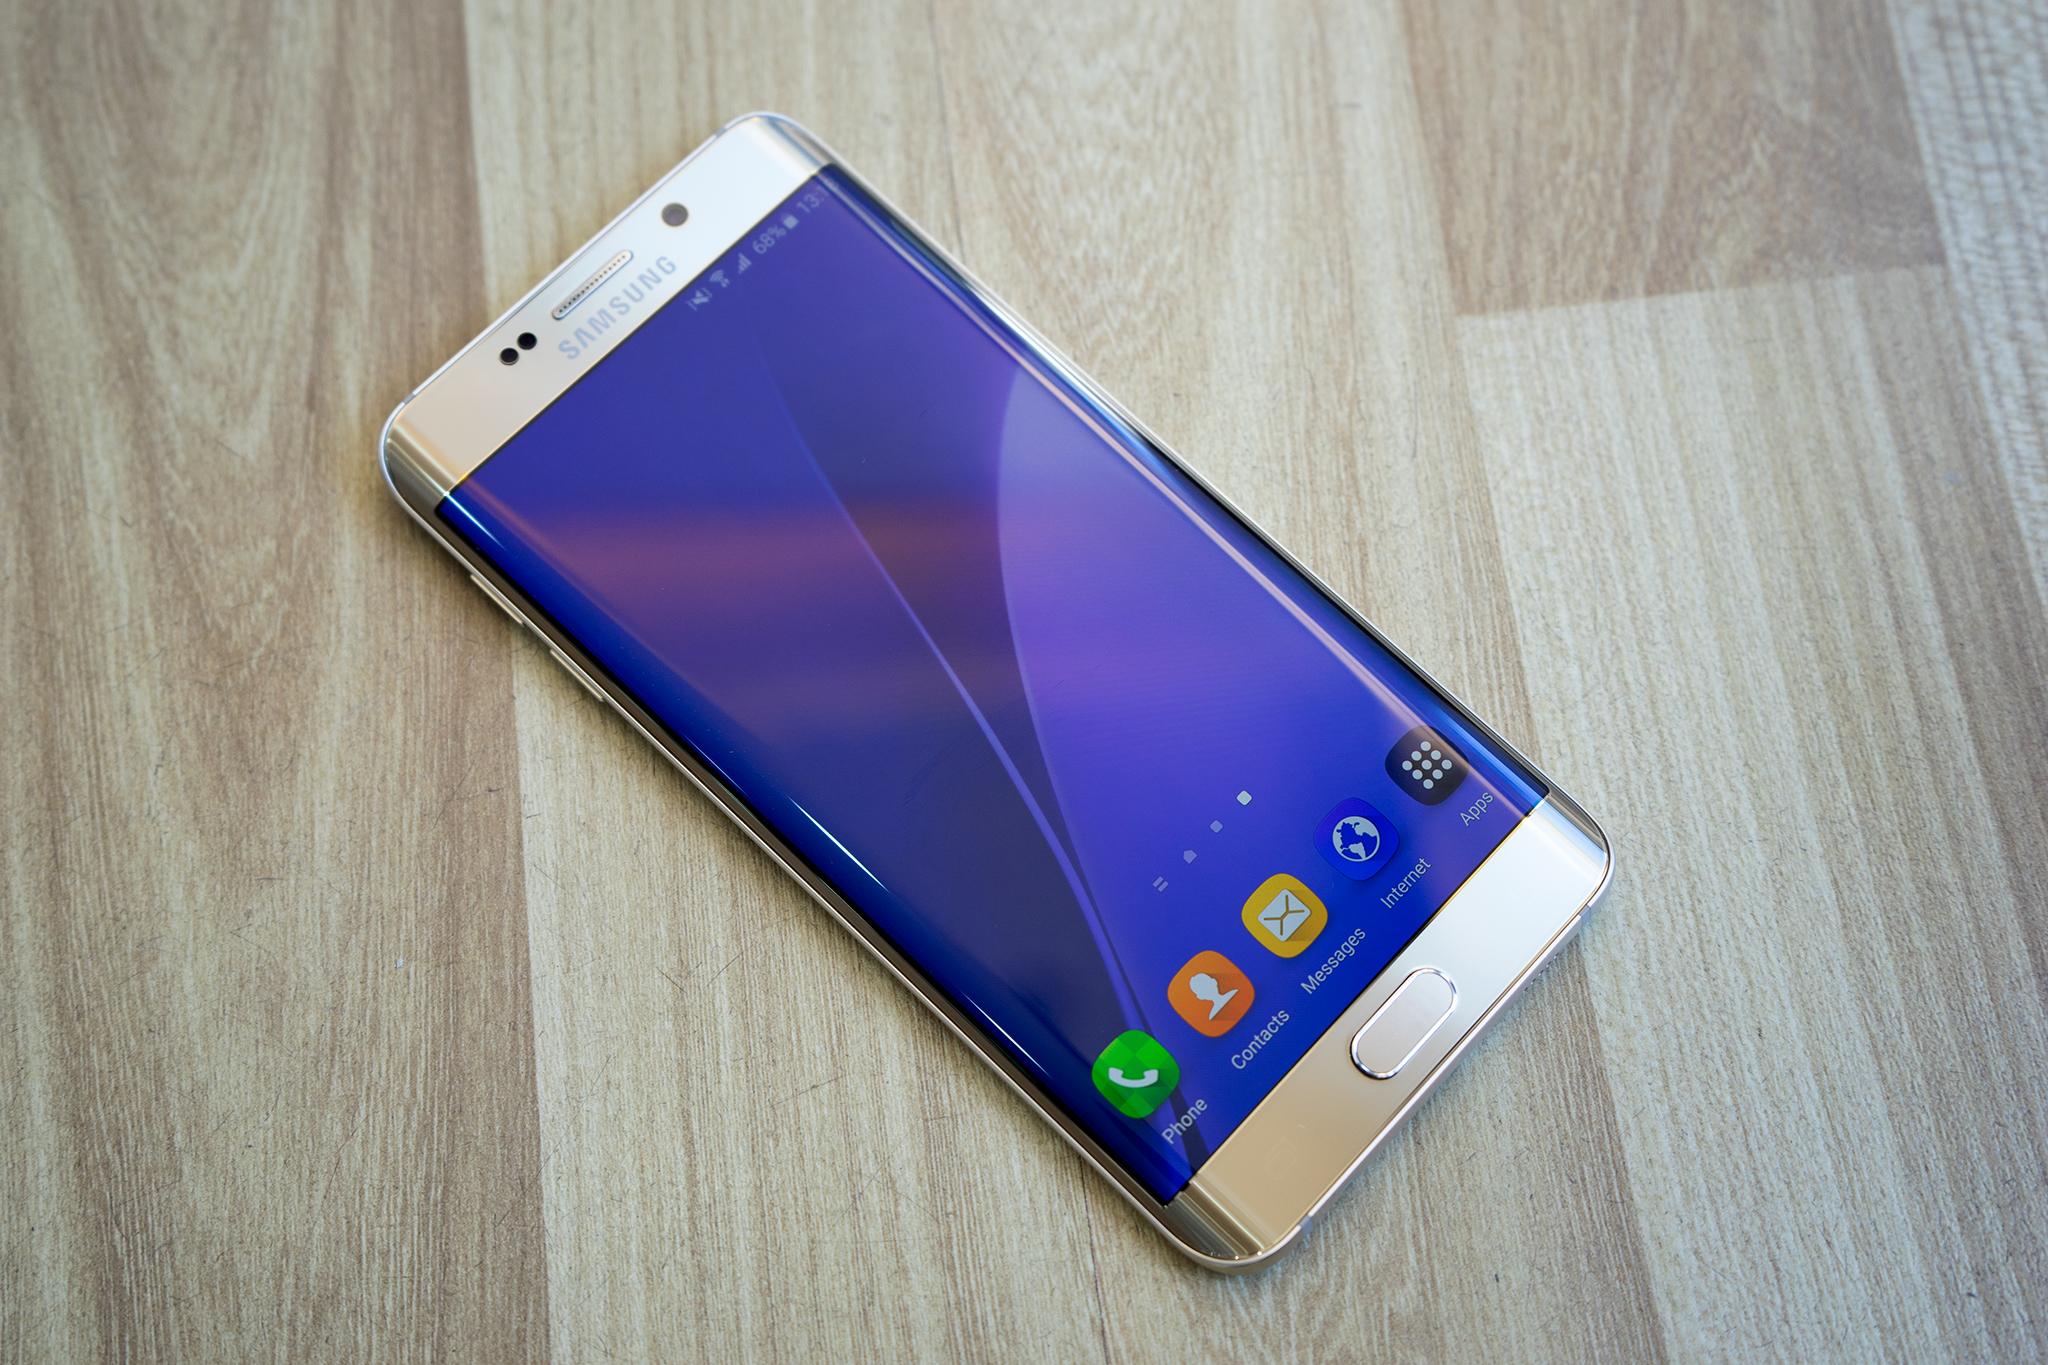 Samsung Galaxy S6 Edge Plus trên tay bạn